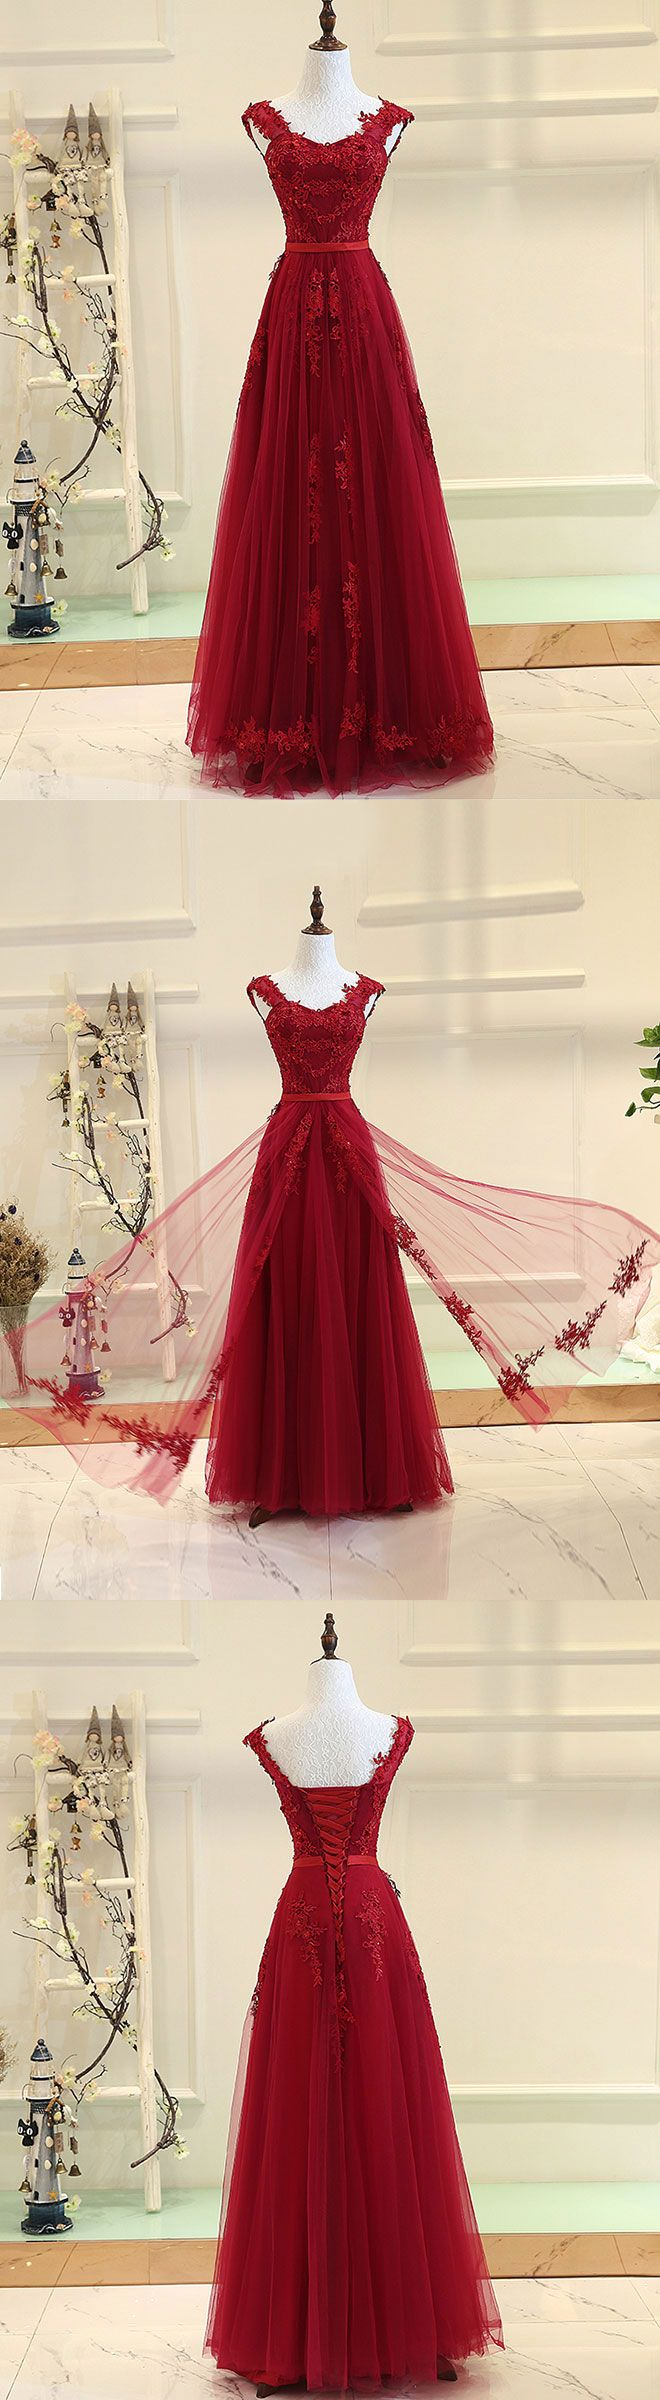 Burgundy sweetheart neck long prom dress burgundy evening dress